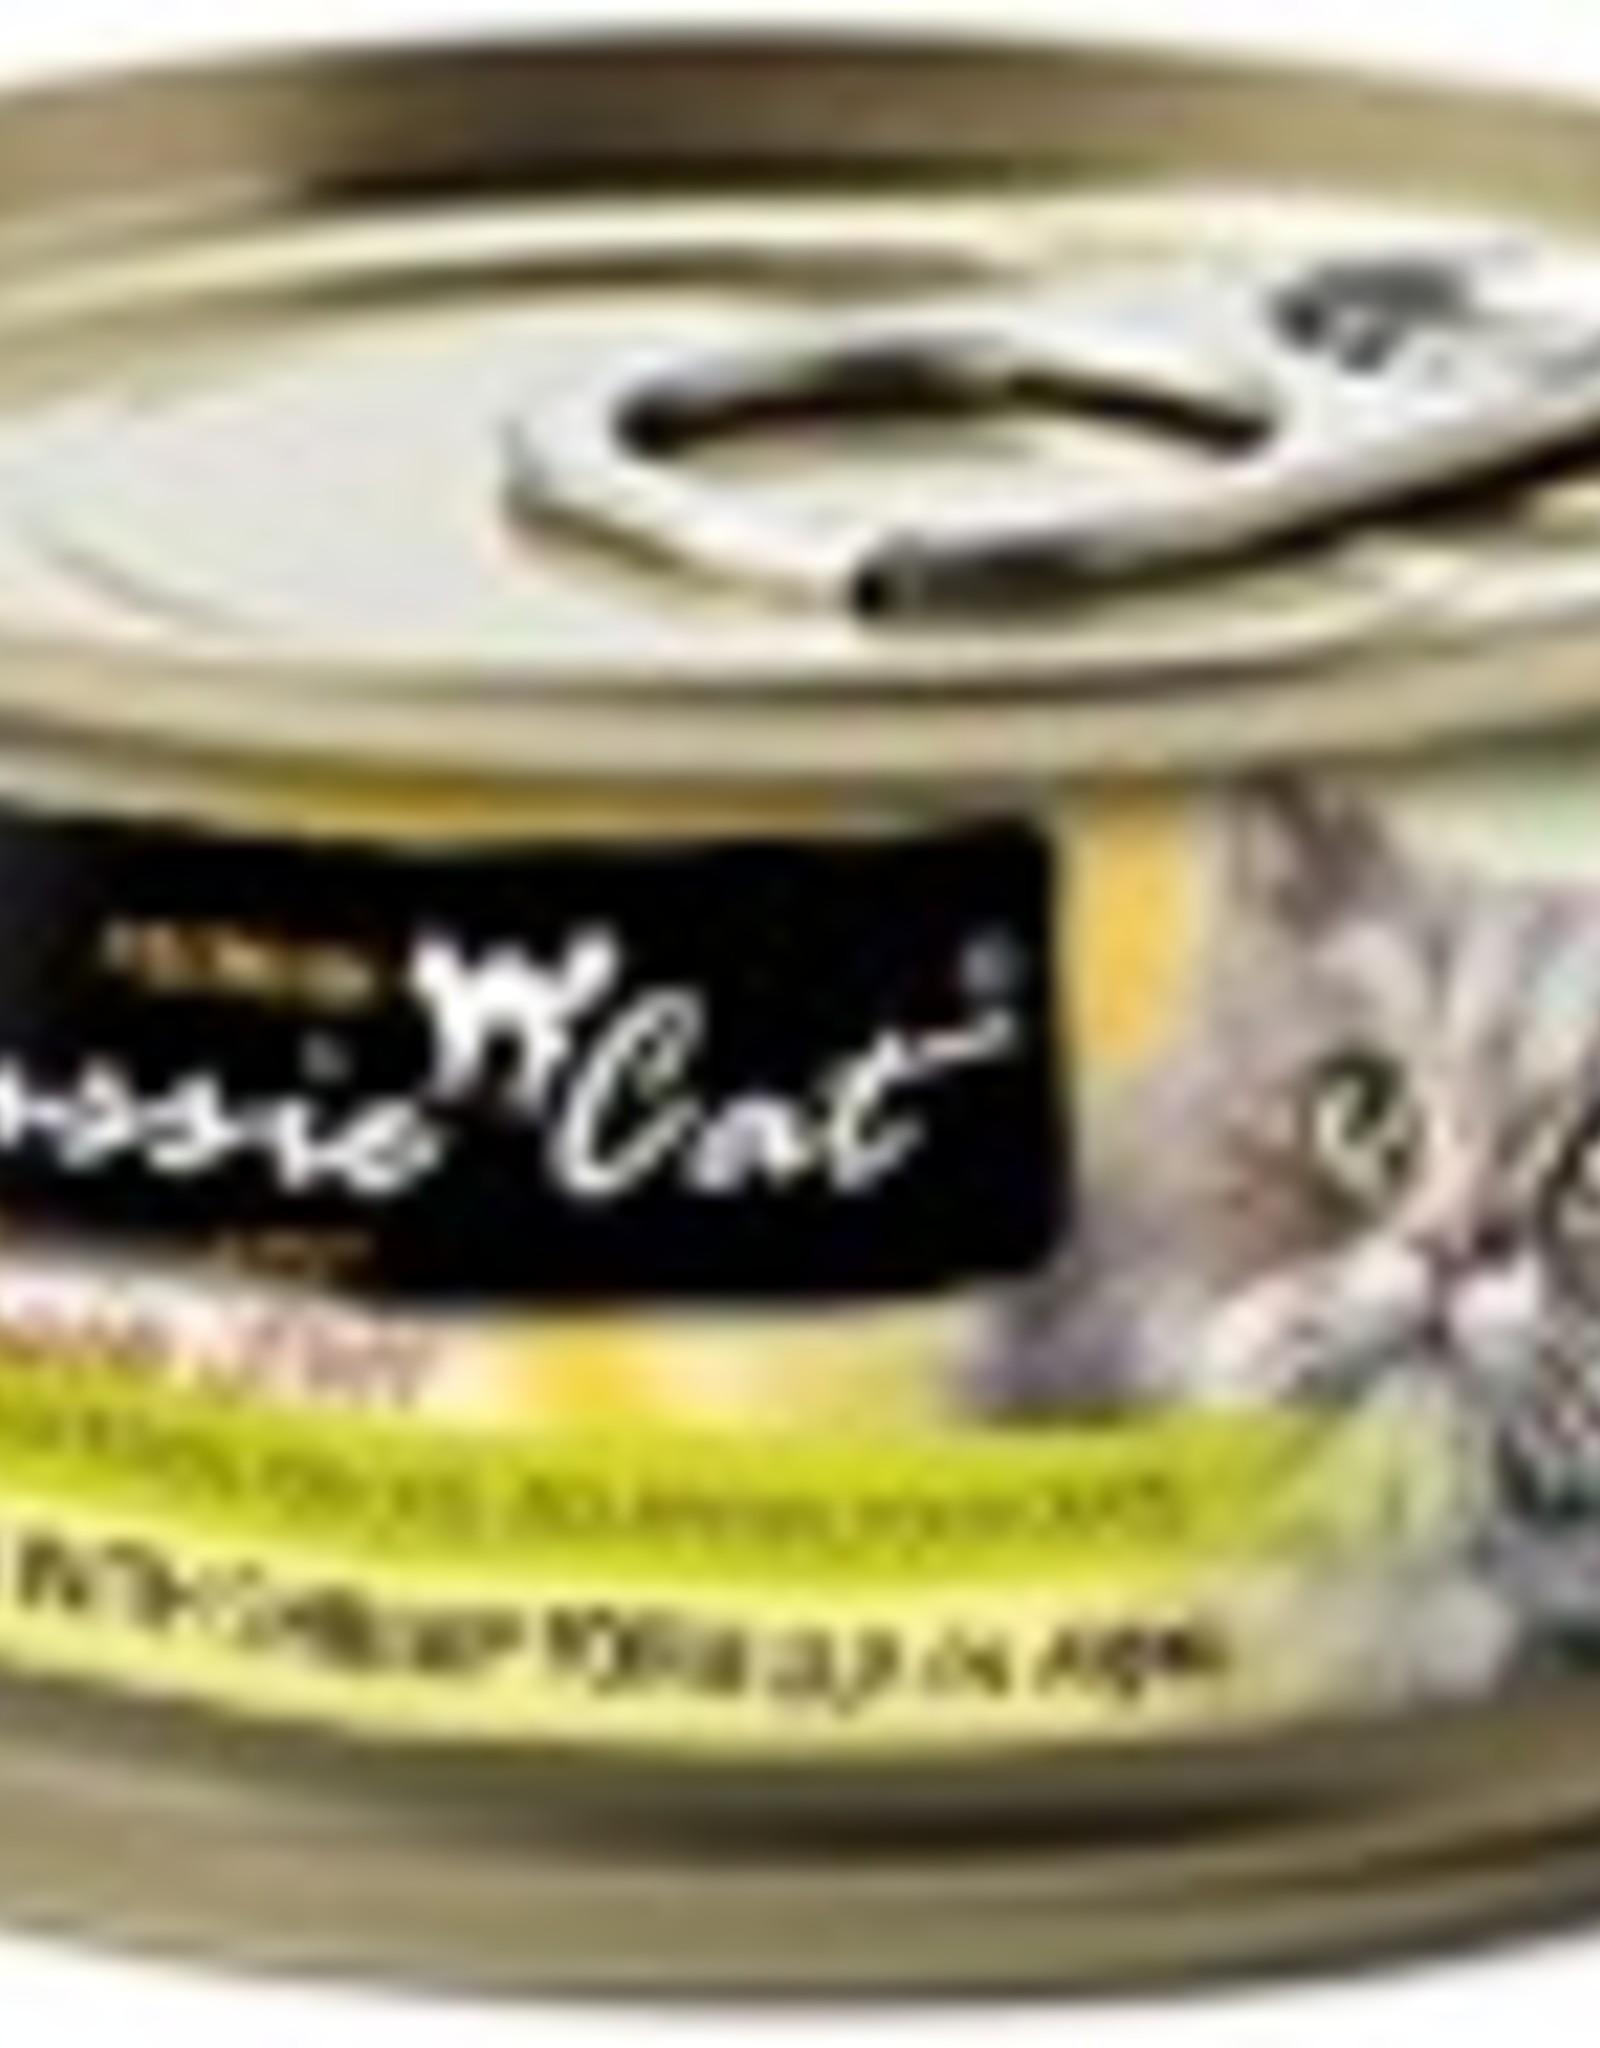 Fussie Cat Premium Tuna with Shrimp Formula in Aspic Grain-Free Canned Cat Food, 2.82 oz.